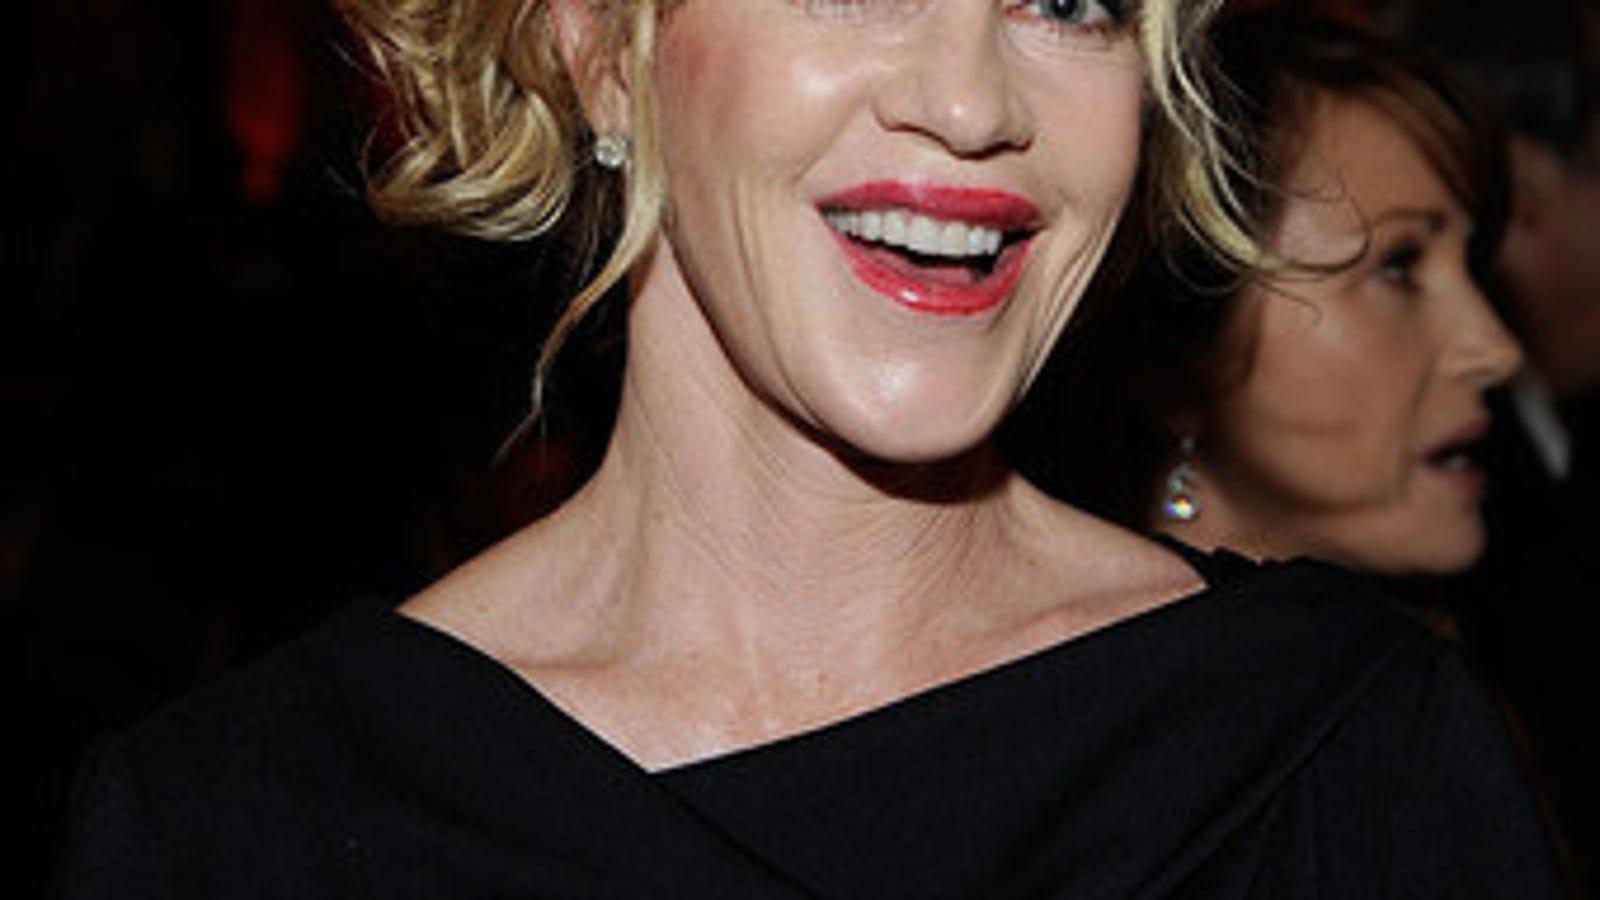 Nicollette Sheridan,Dorothy Wilson (actress) Porno picture Kathleen Harrison,Nicole Sullivan